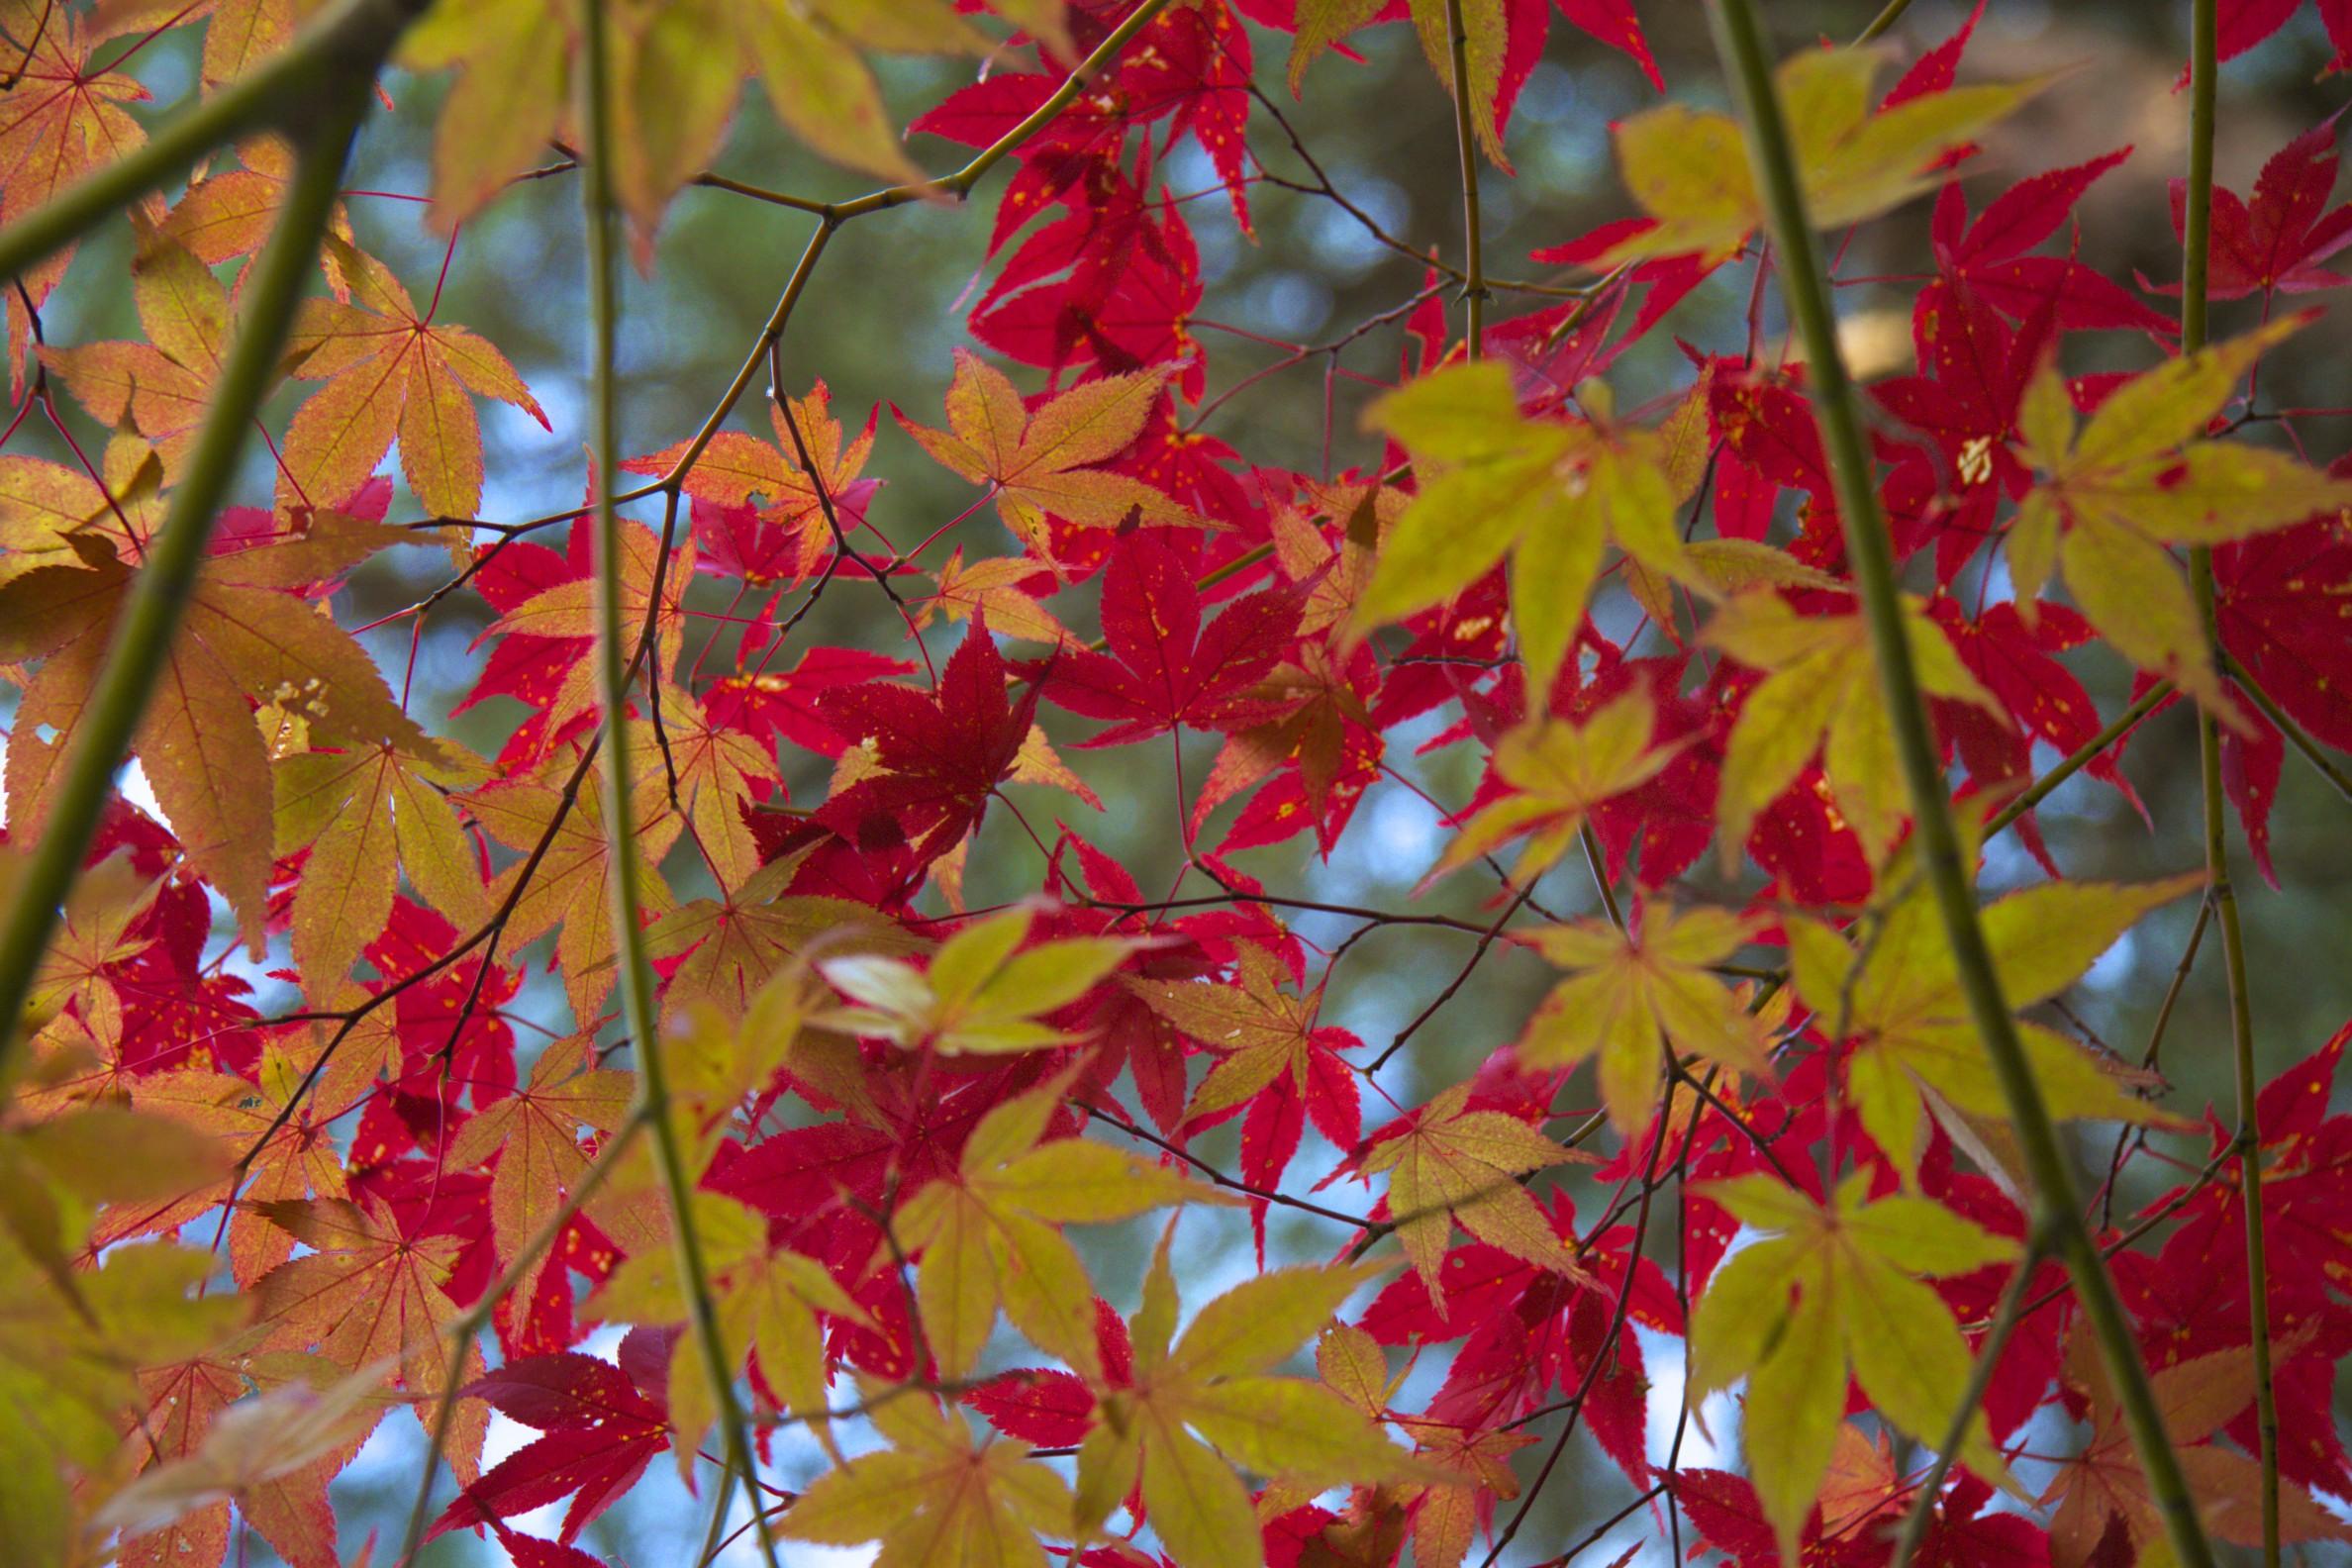 Marple leaves - Autumn in Japan